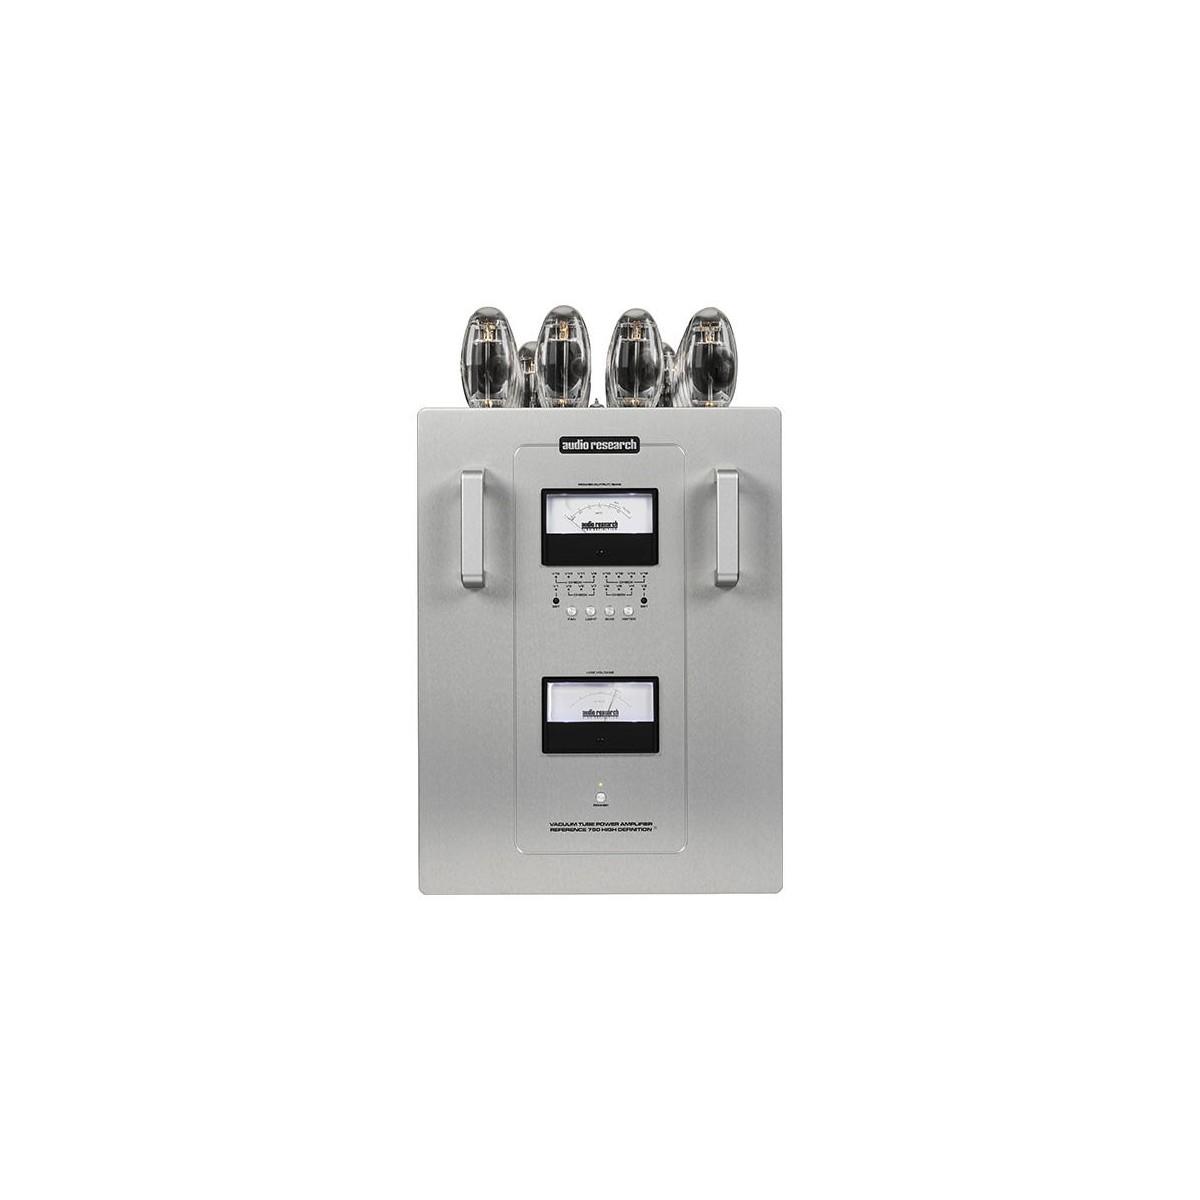 Wzmacniacz mono Reference 750 SE-I NATURAL